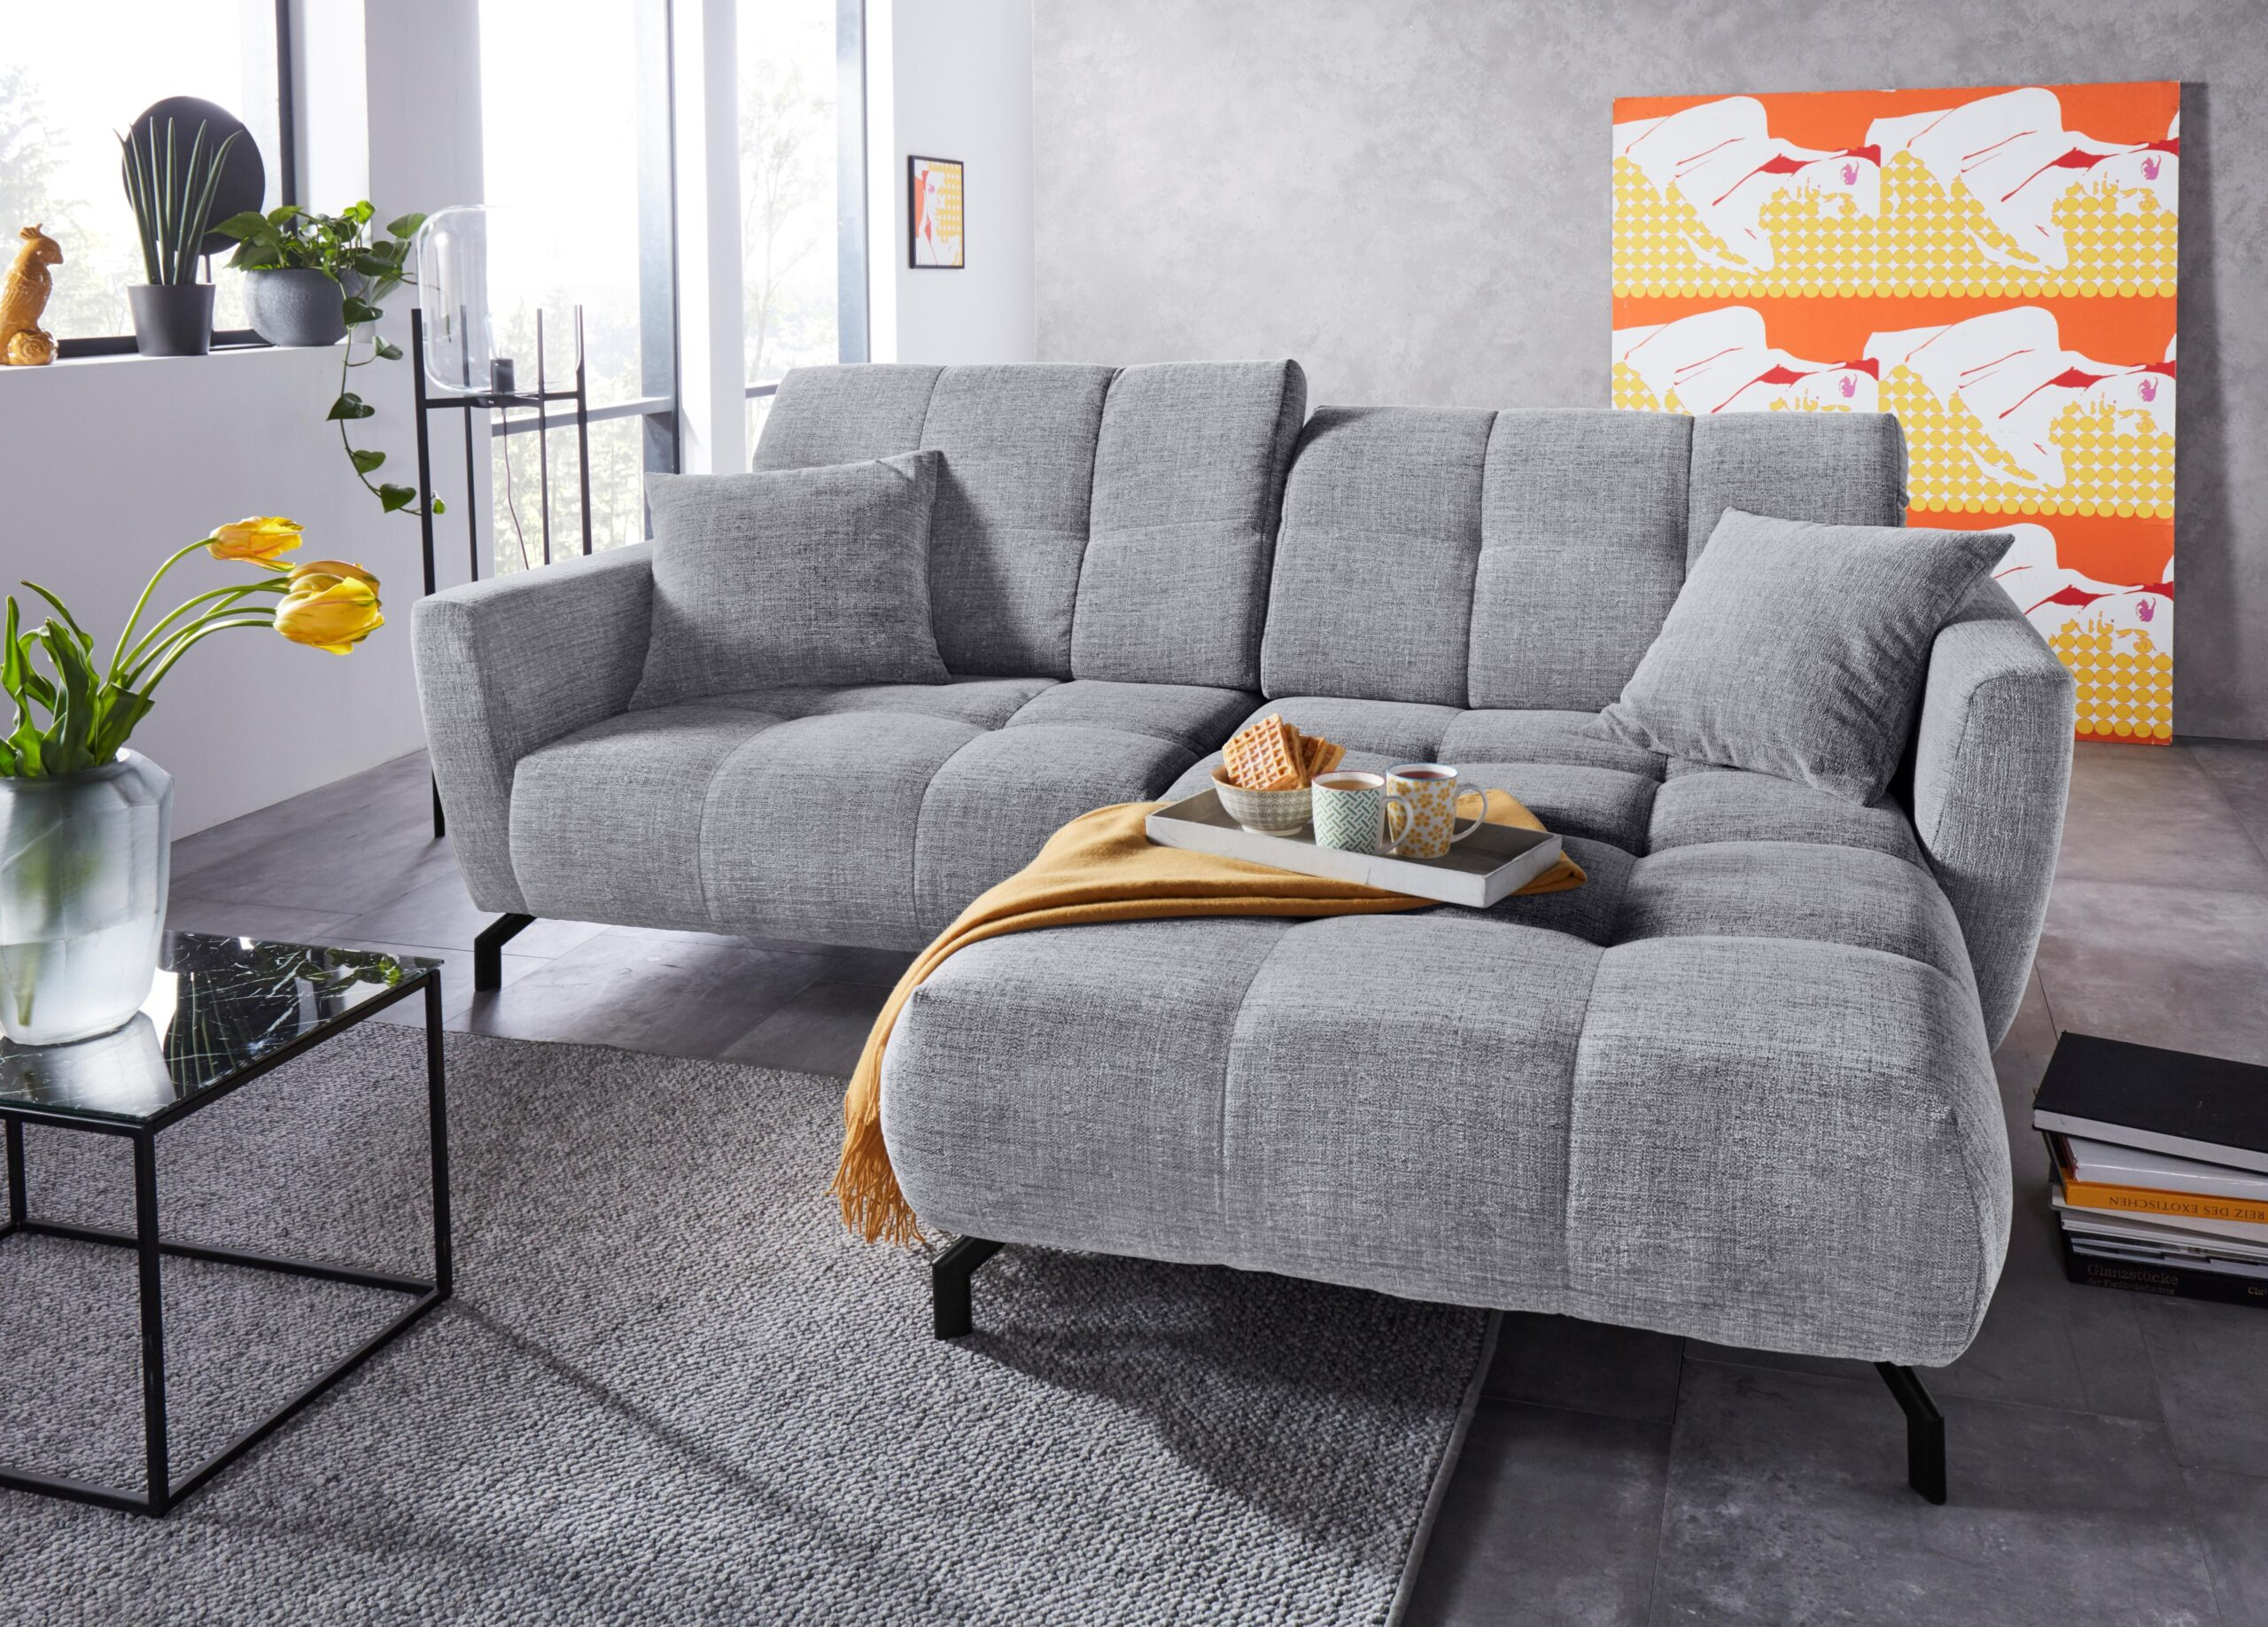 Full Size of Xora Jugendzimmer Sofa Set Online Shopping Tamilnadu Kleines Schlafsofa Fr Big Bett Wohnzimmer Xora Jugendzimmer